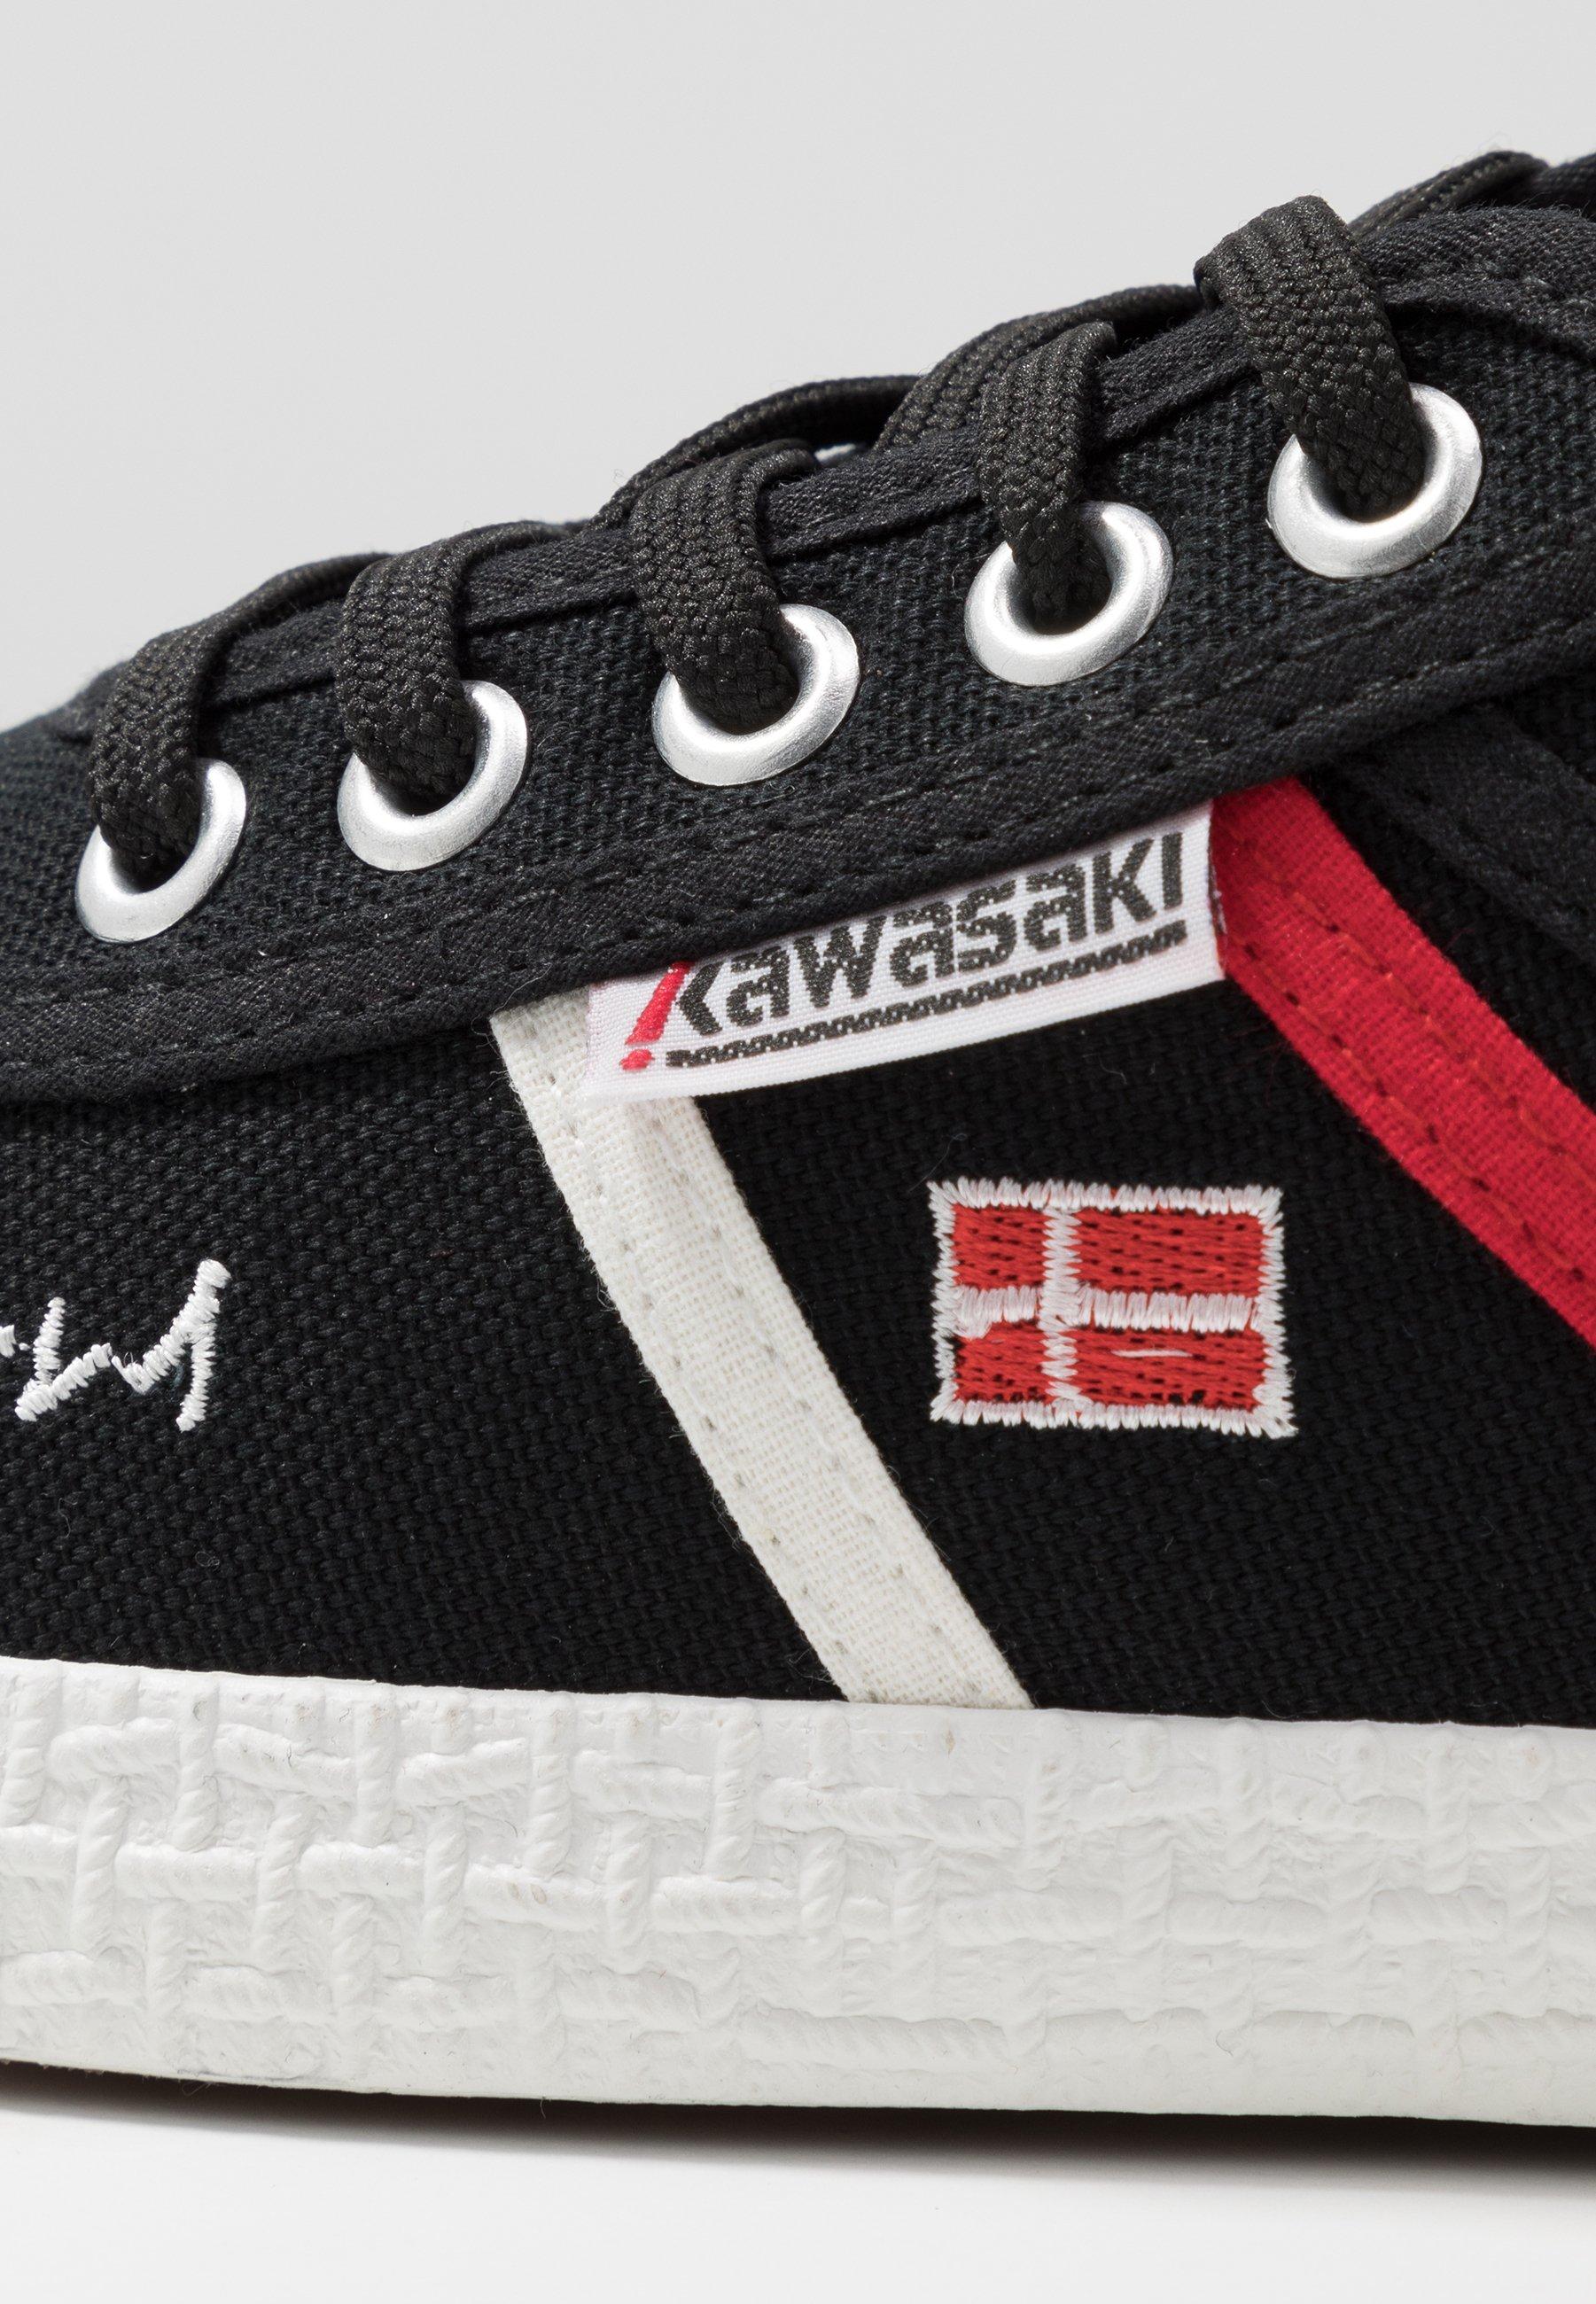 Kawasaki SIGNATURE Joggesko black Zalando.no